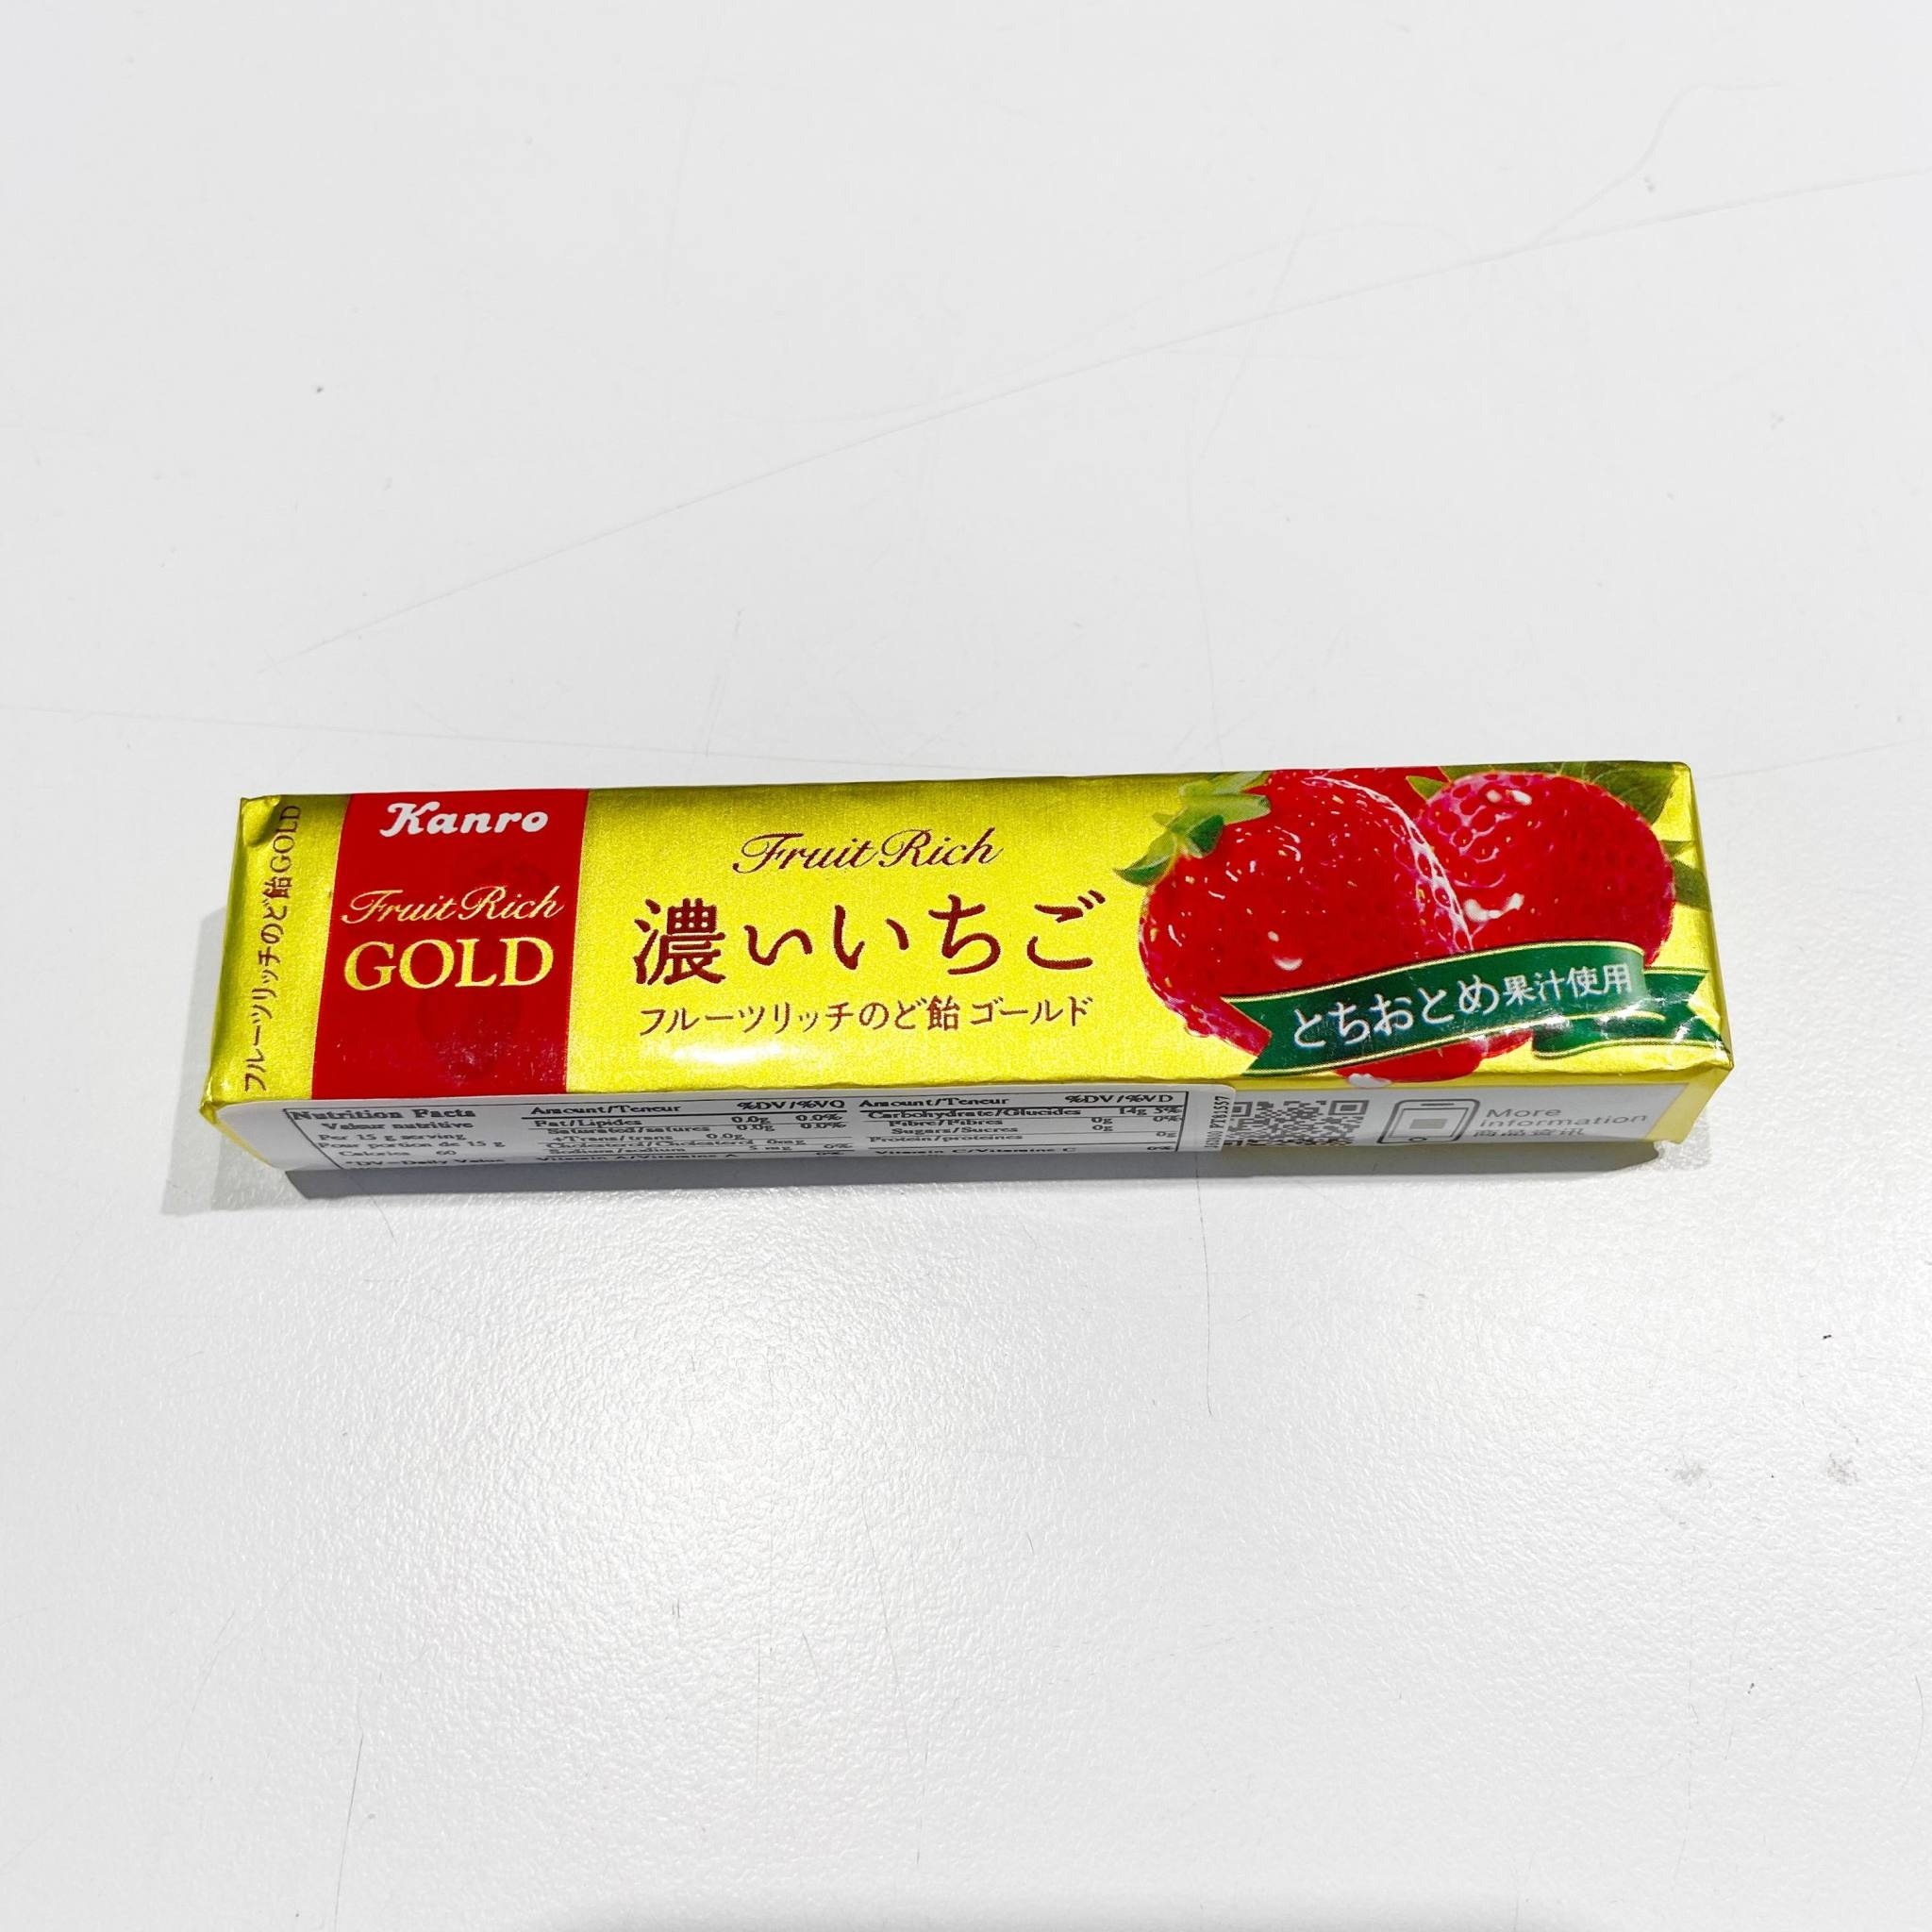 Kanro Gold Nodoame Koi Ichigo